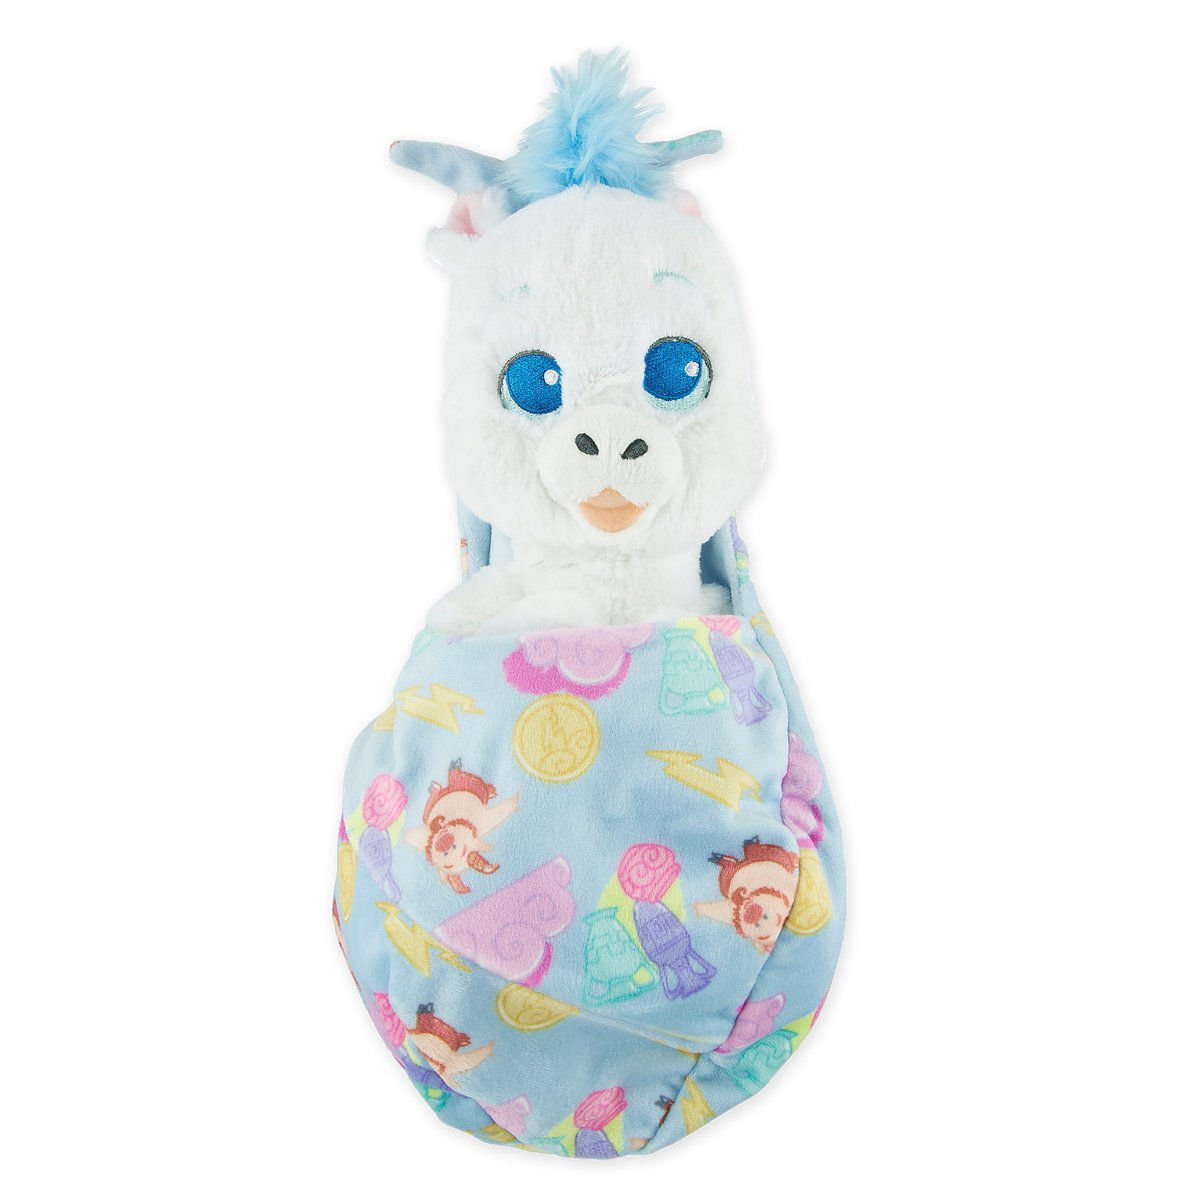 Disney Parks Pegasus Plush with Blanket Pouch - Disney's Babies - Small